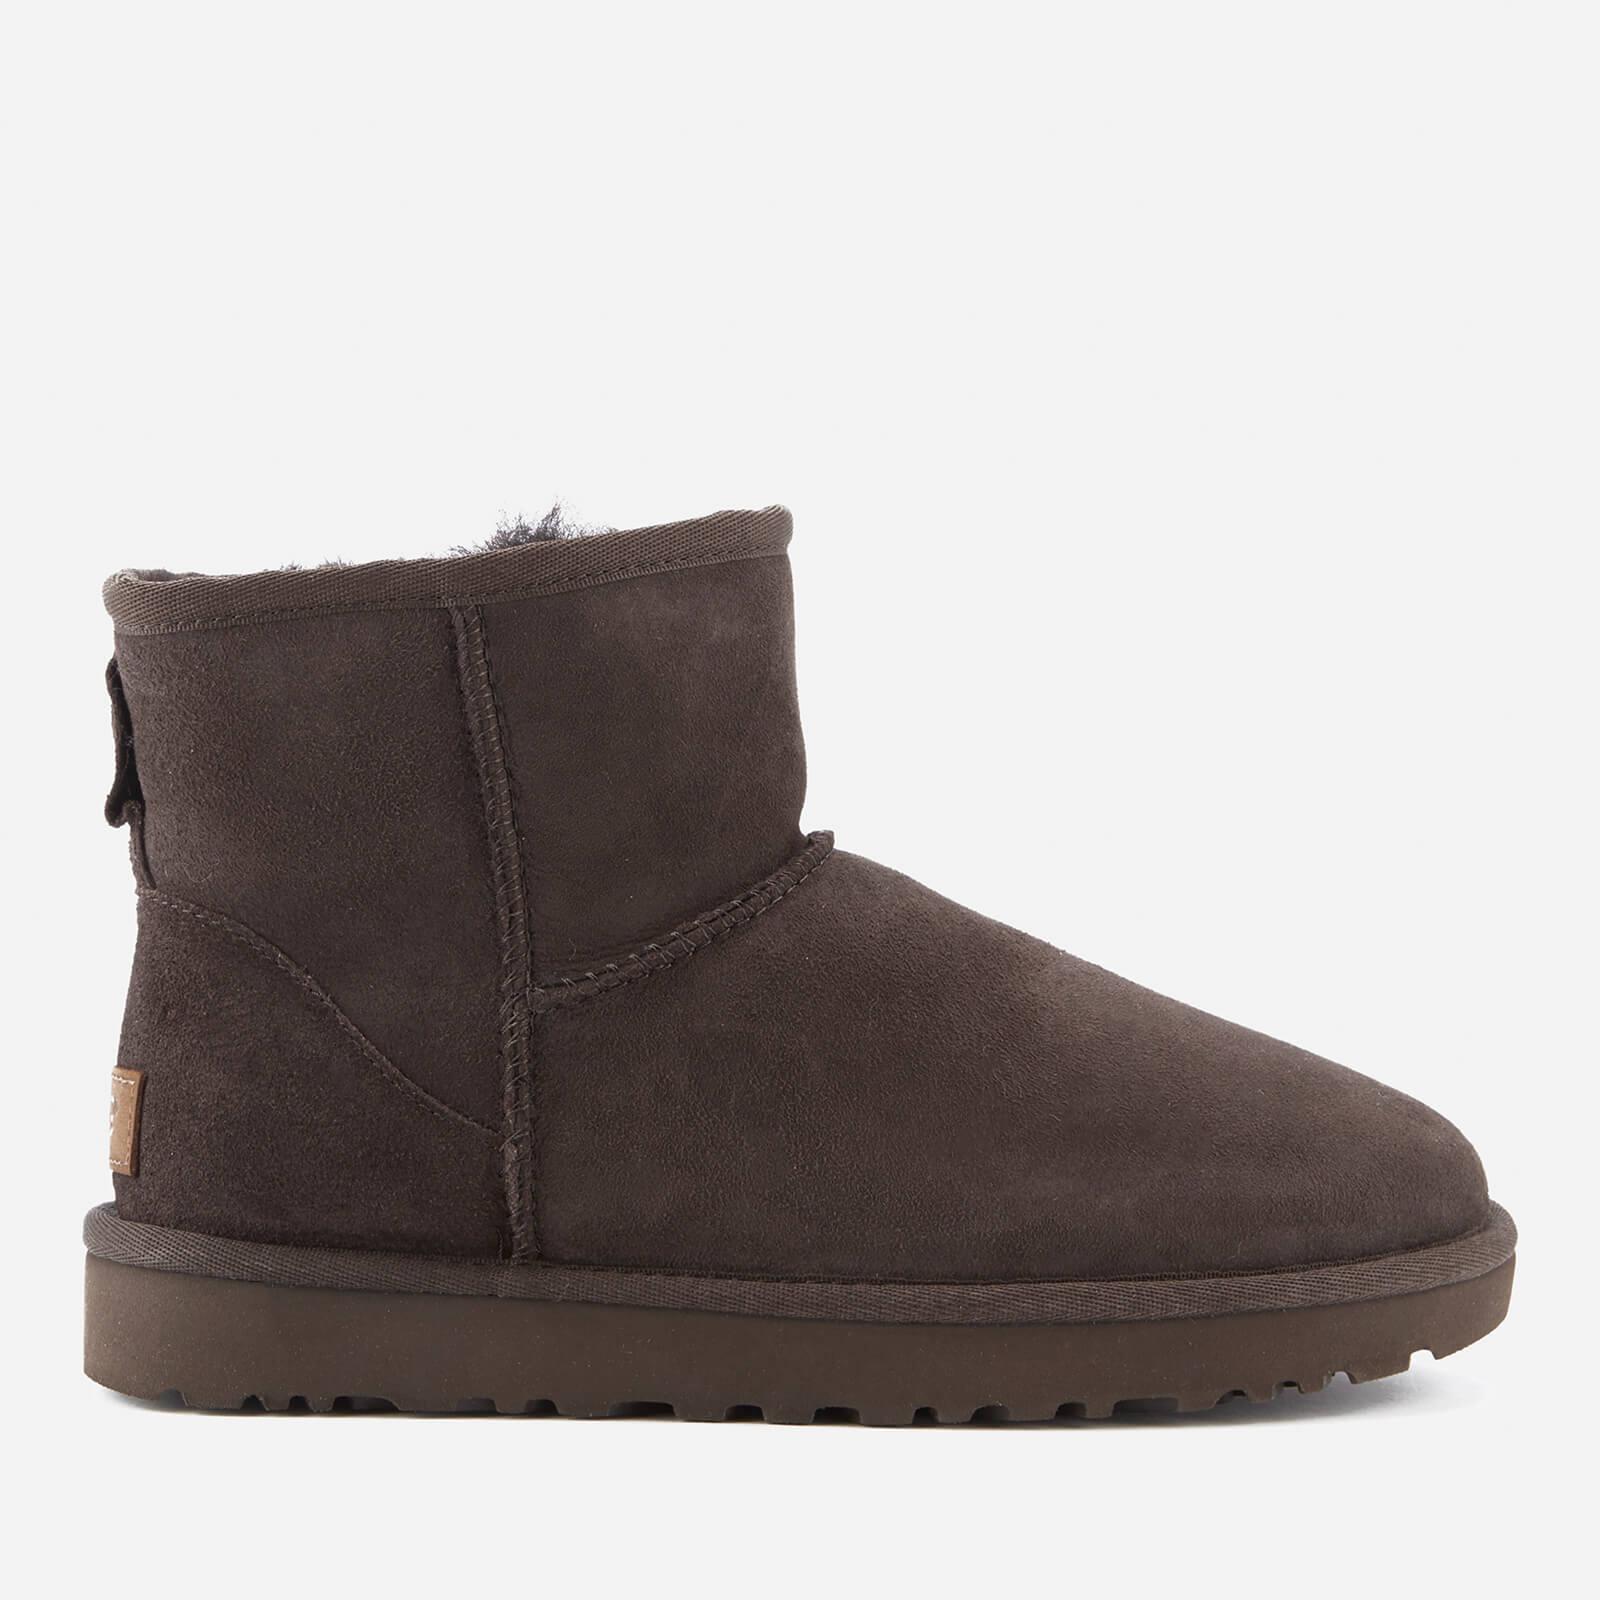 161741c1535 UGG Women's Classic Mini II Sheepskin Boots - Chocolate